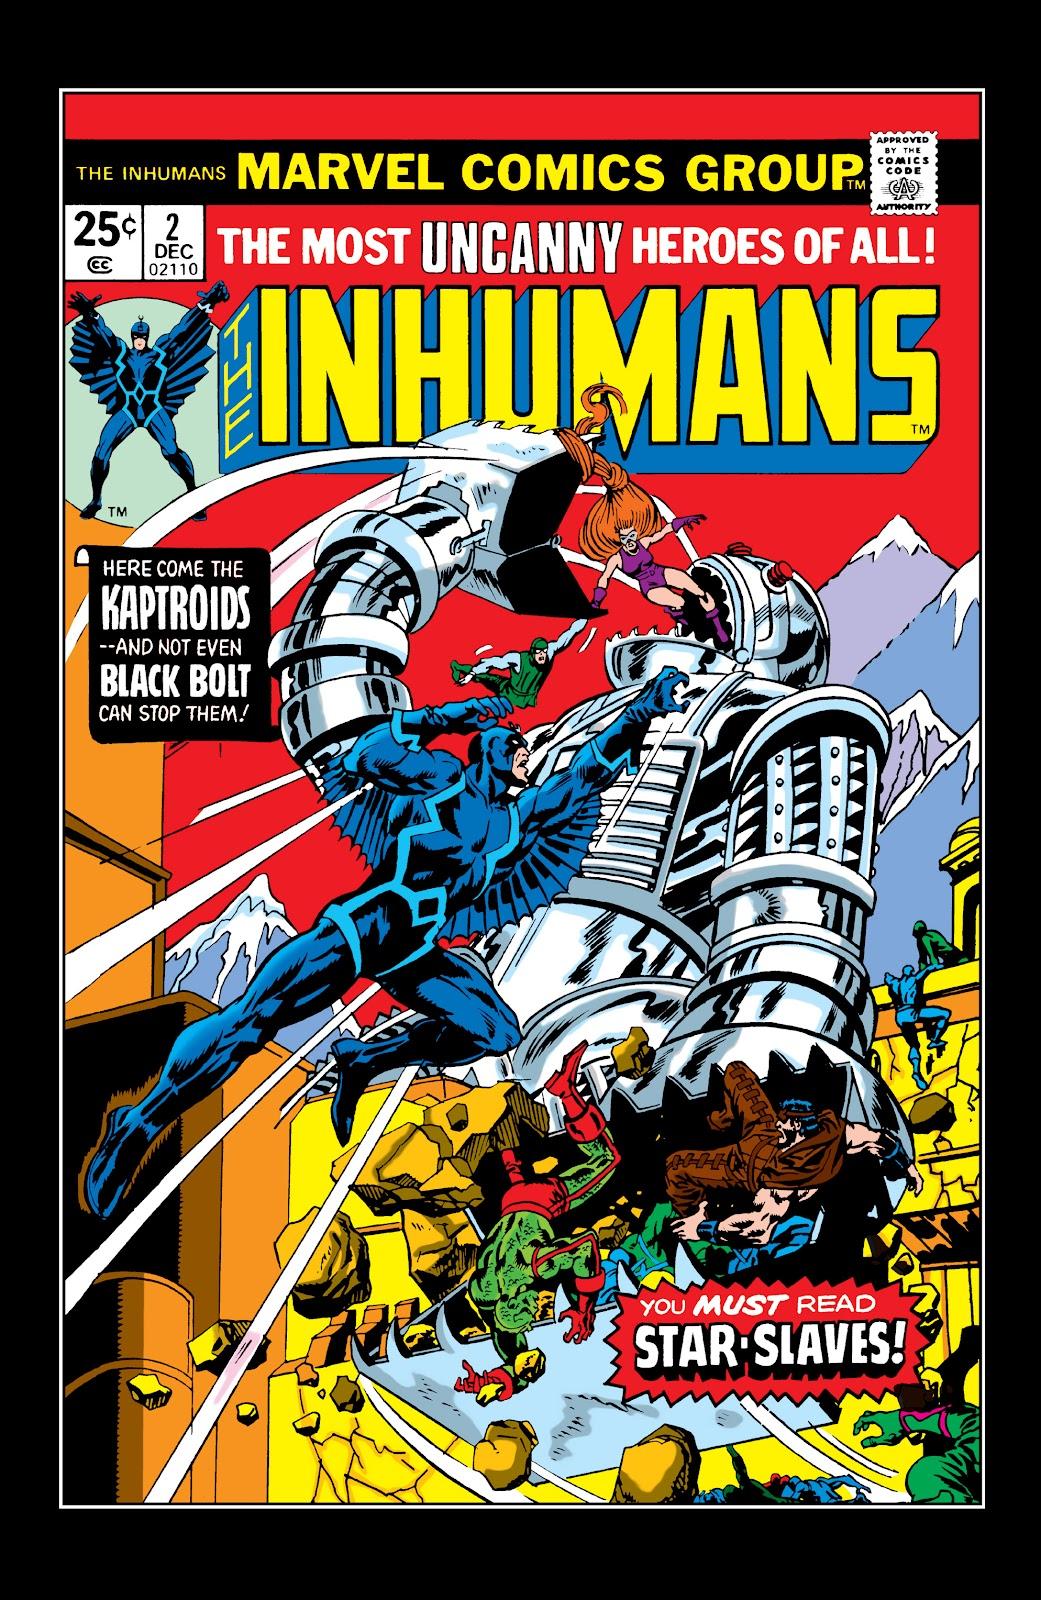 Read online Marvel Masterworks: The Inhumans comic -  Issue # TPB 2 (Part 1) - 26